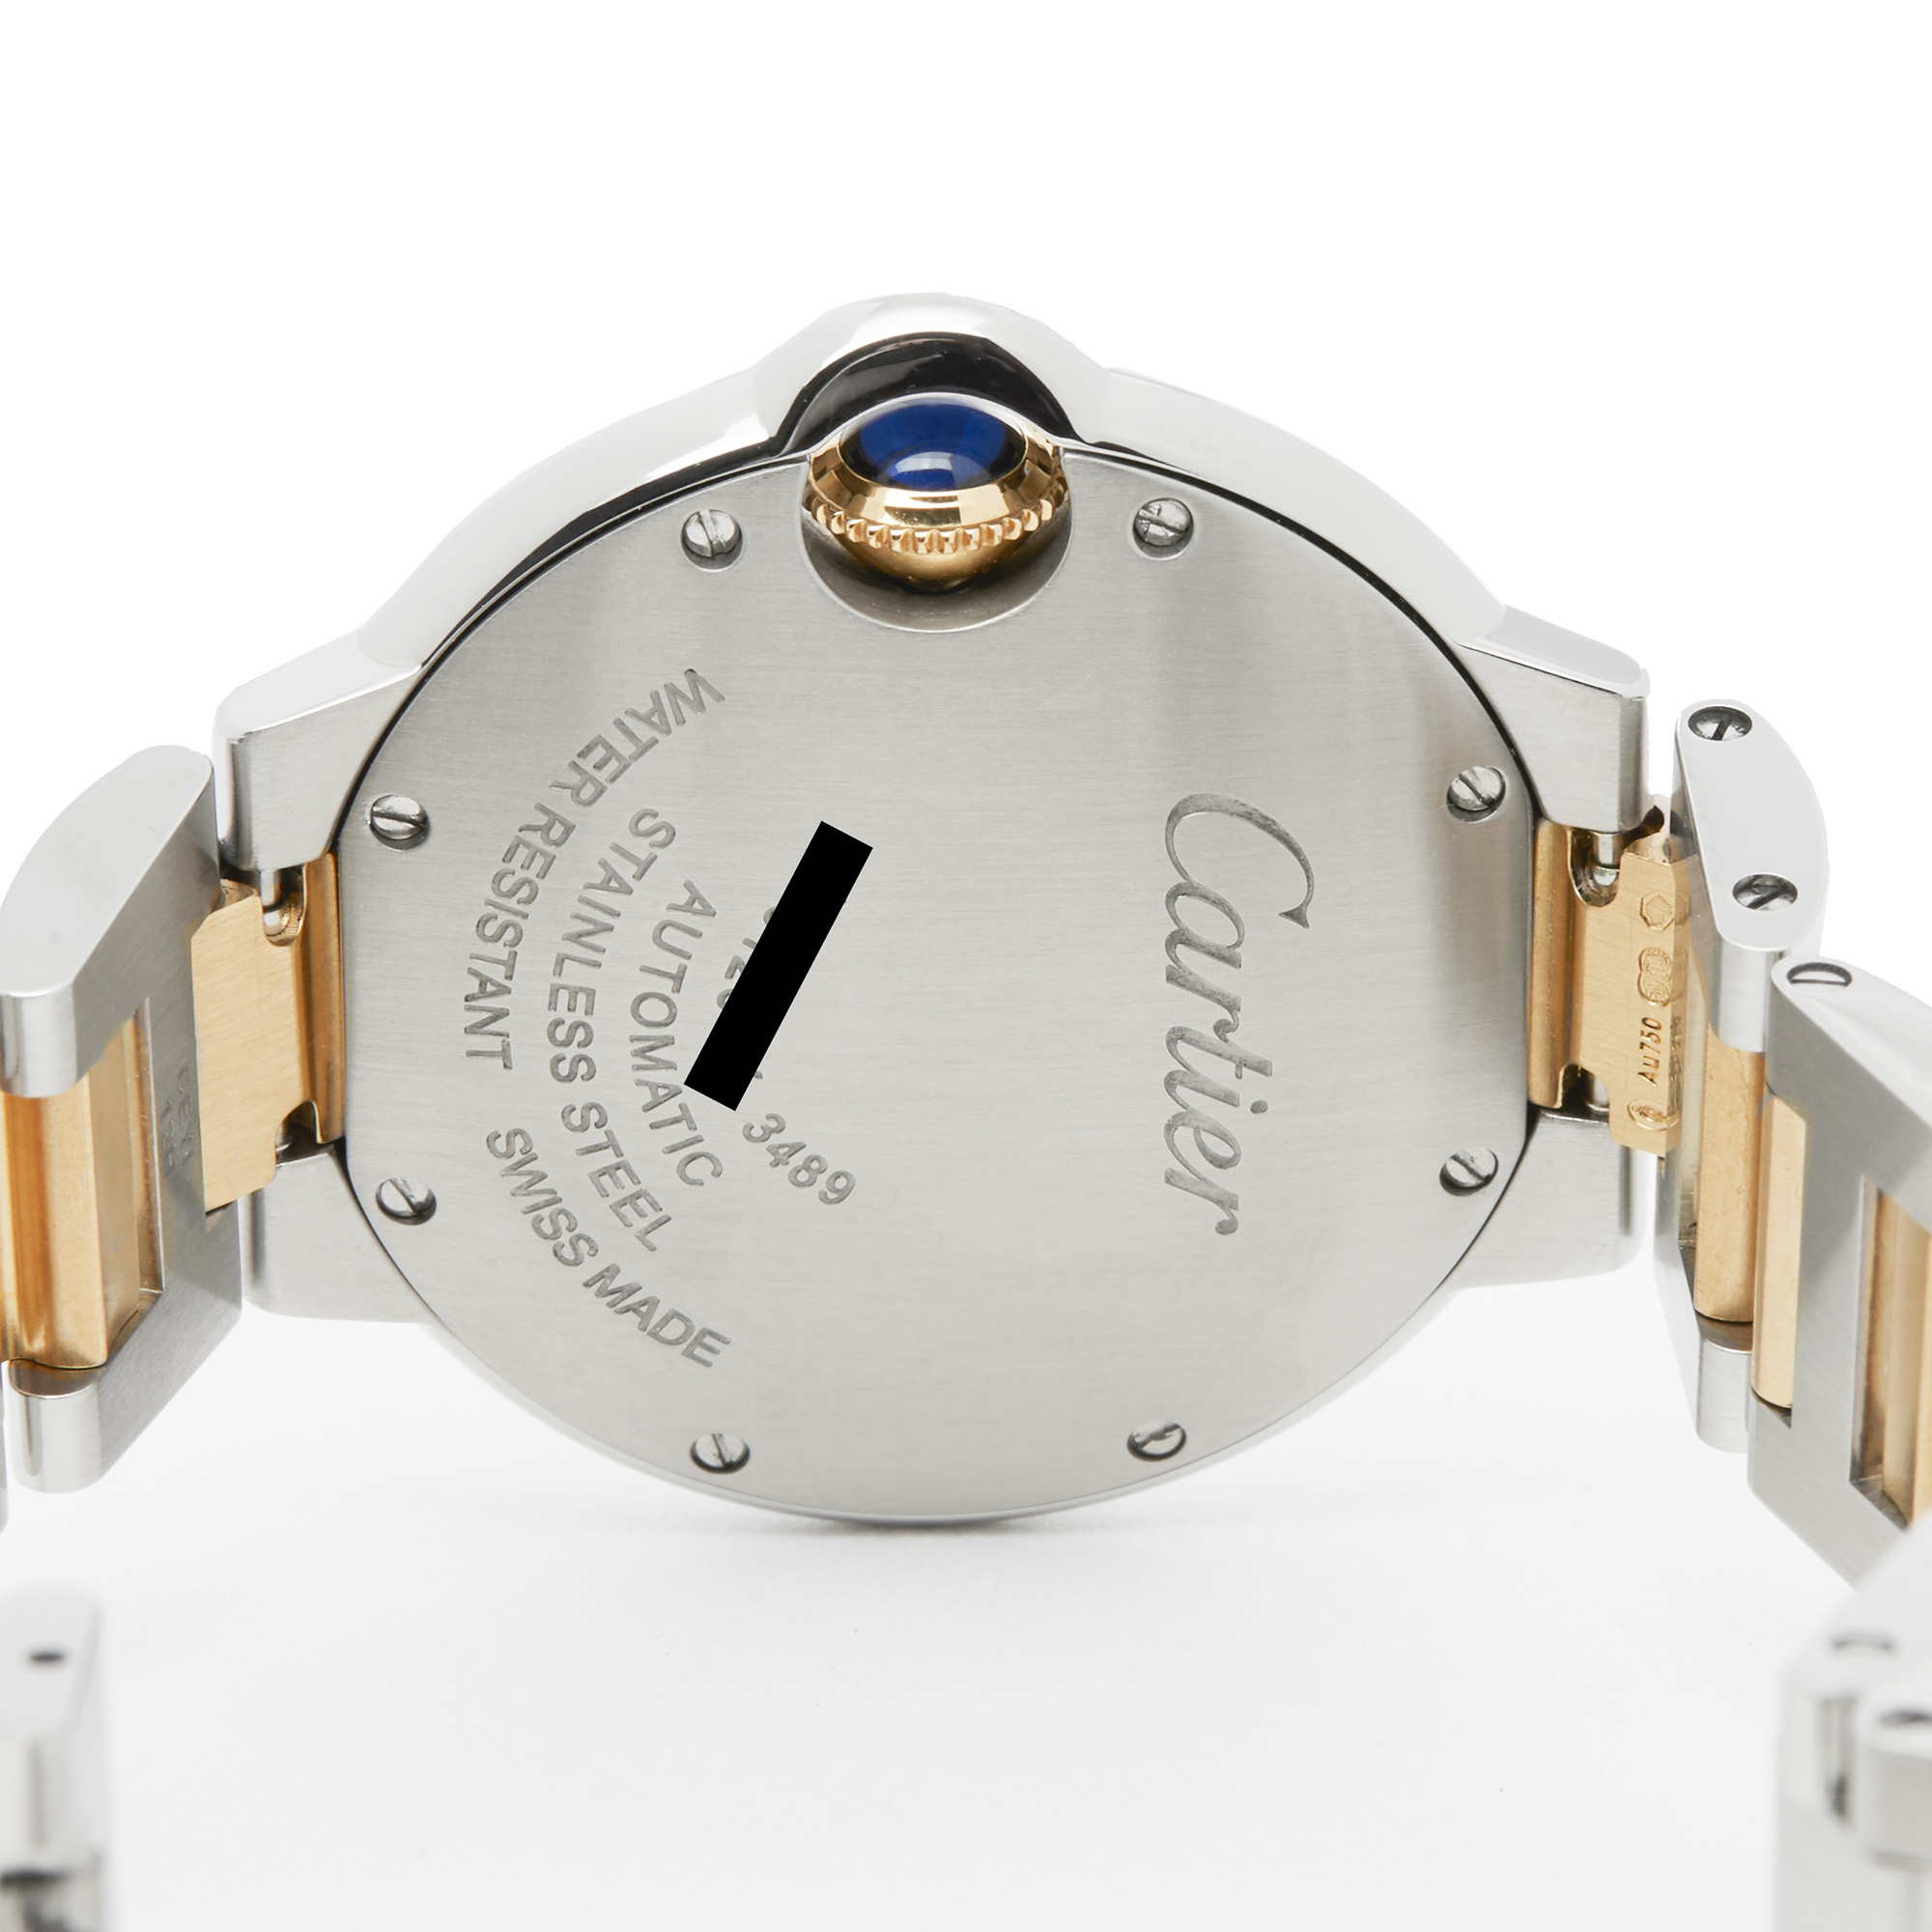 Cartier Ballon Bleu 3489 Ladies Stainless Steel & Yellow Gold Watch - Image 4 of 8